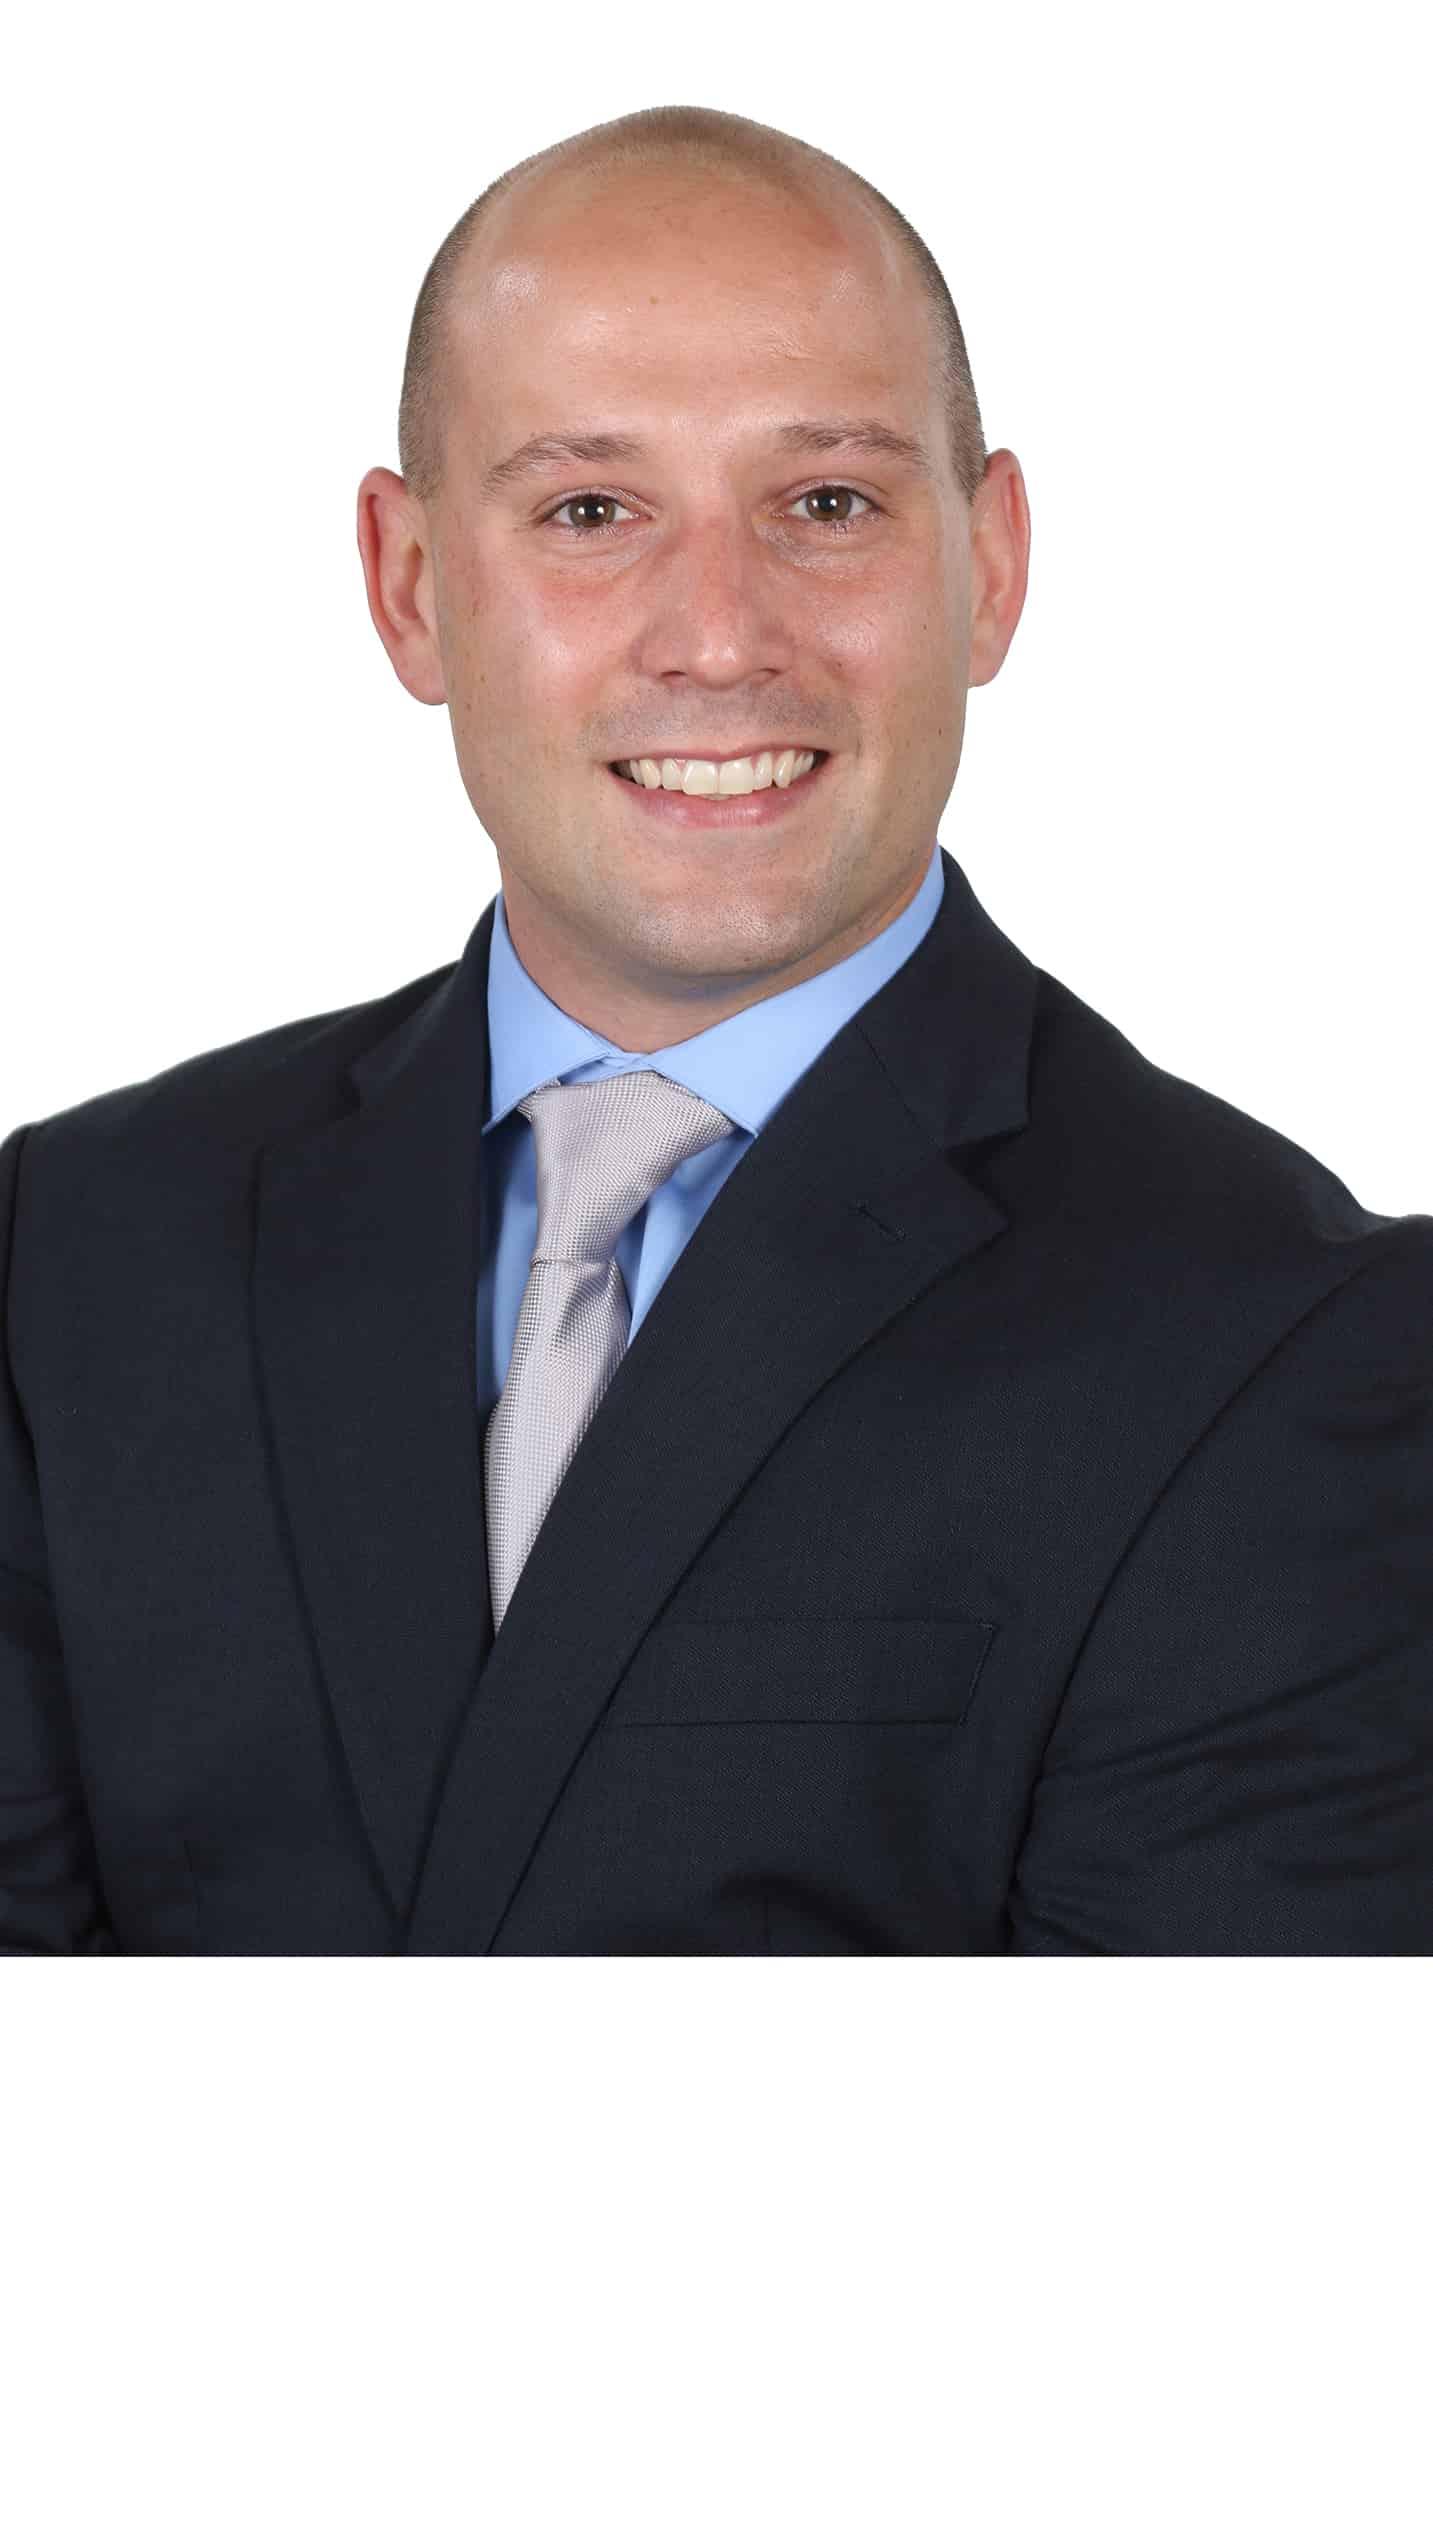 Paul Vittozzi